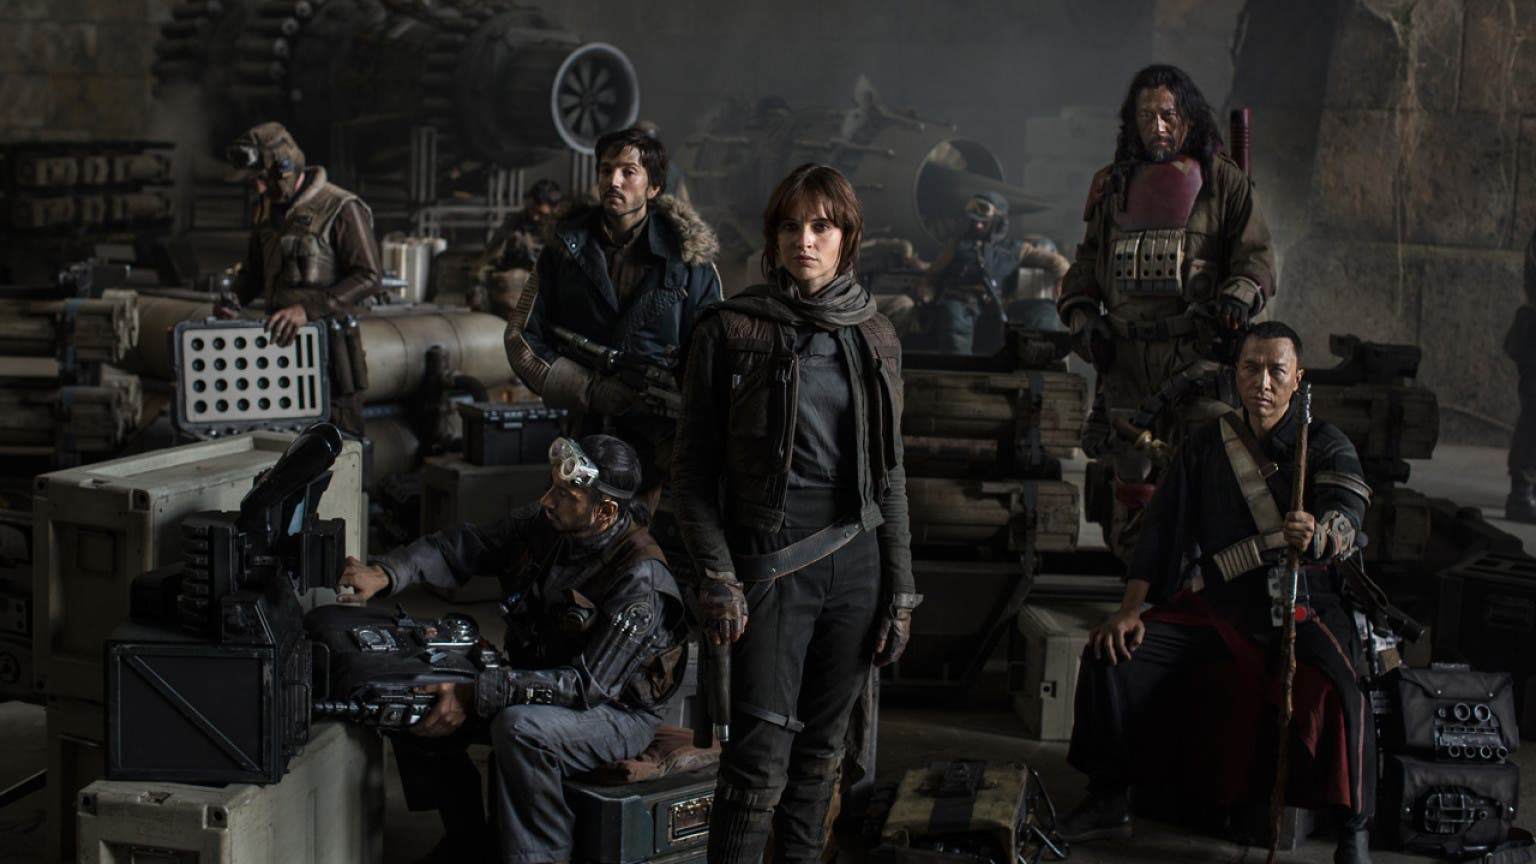 El elenco de actores de Rogue One: A Star Wars Story